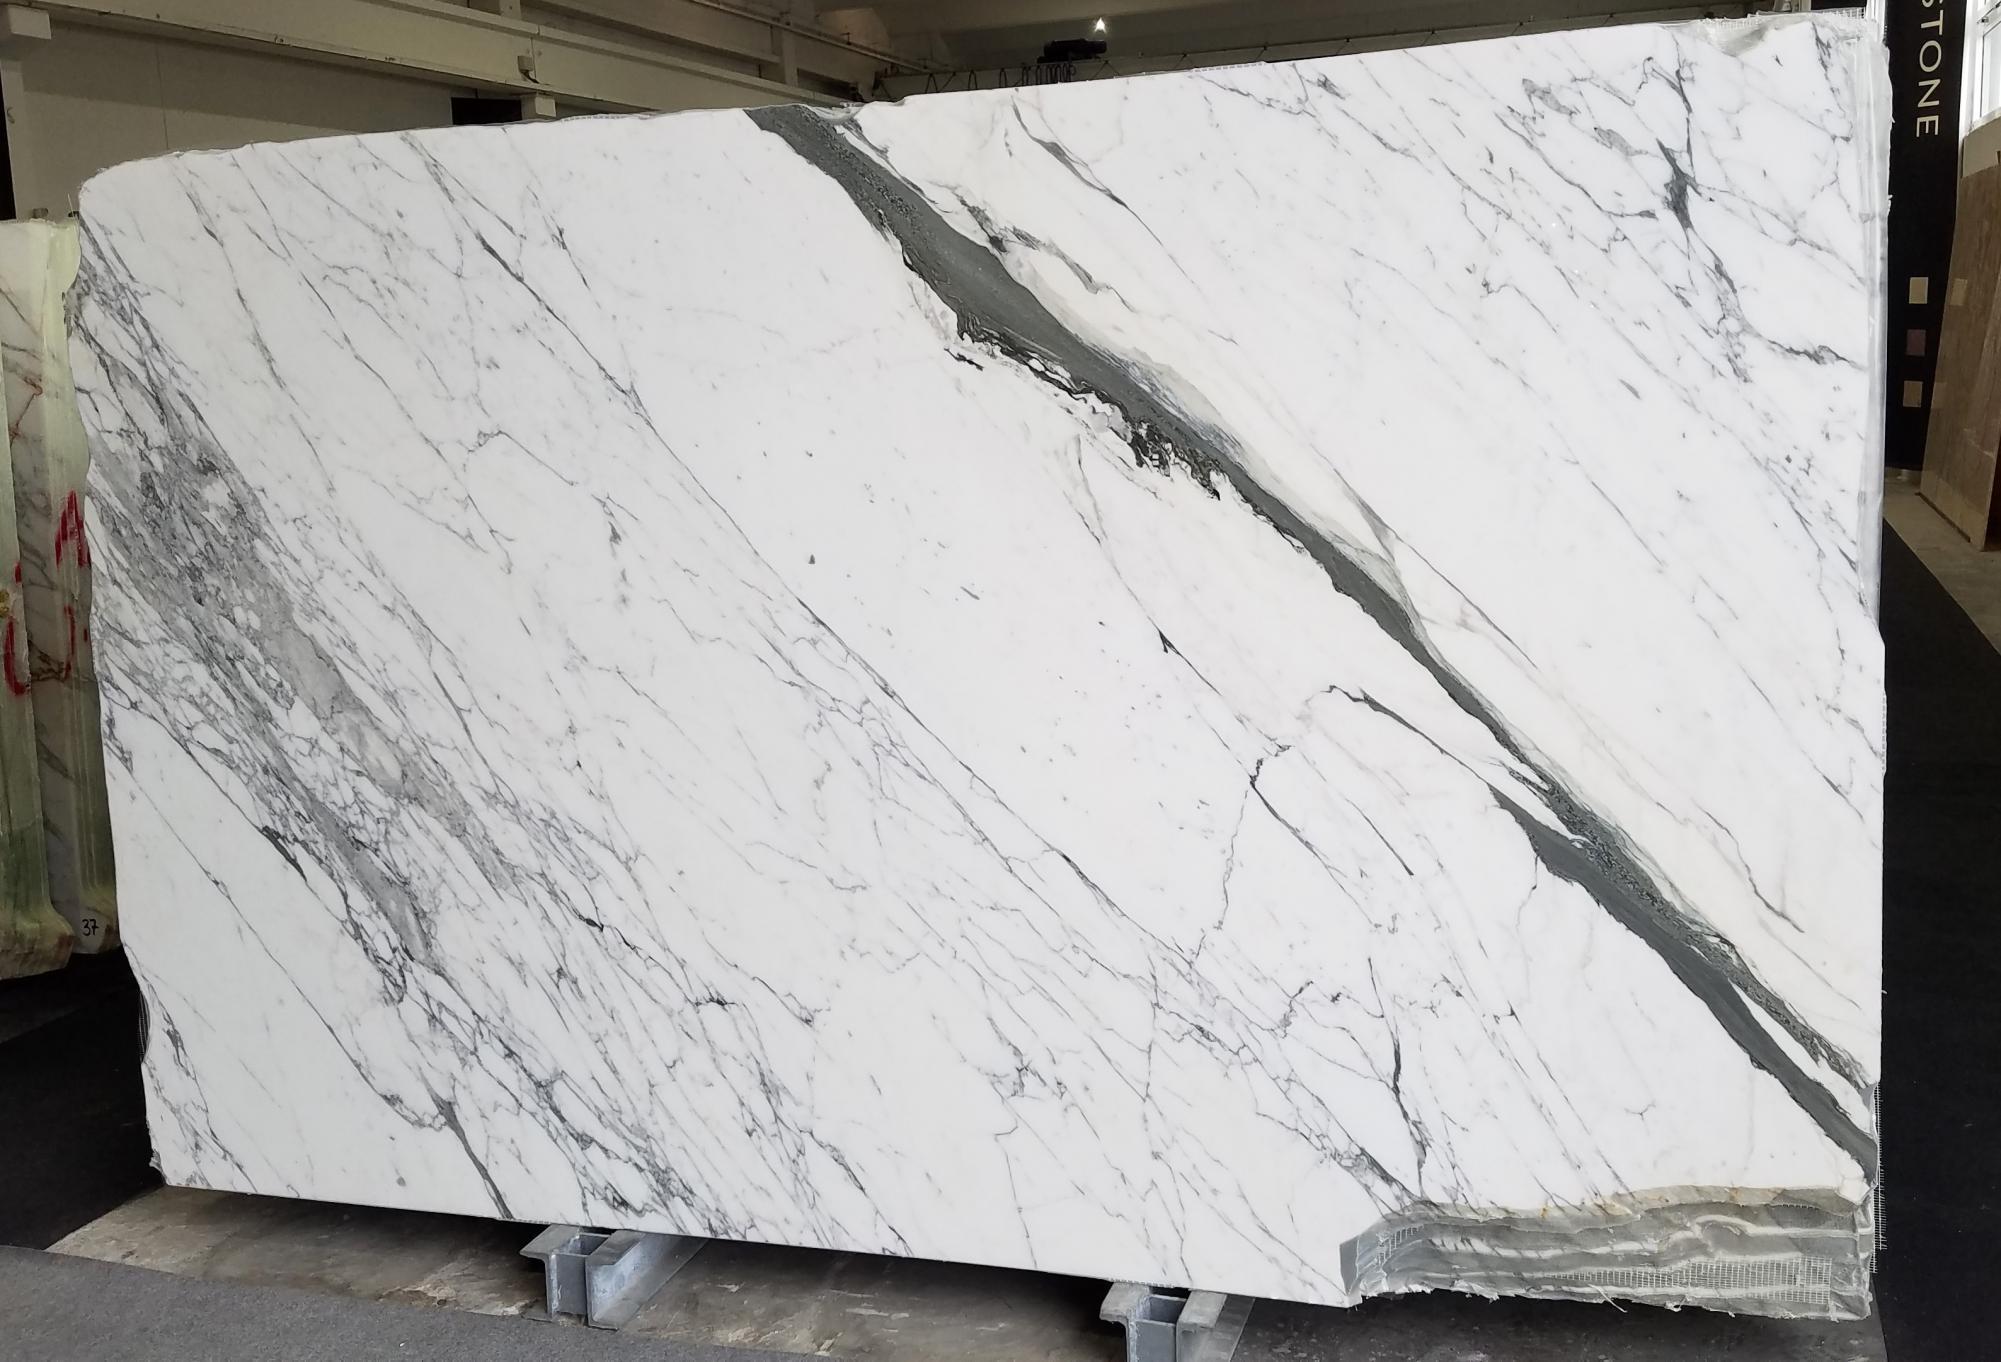 STATUARIO VENATO Suministro Veneto (Italia) de planchas pulidas en mármol natural Z0333 , Slab #65